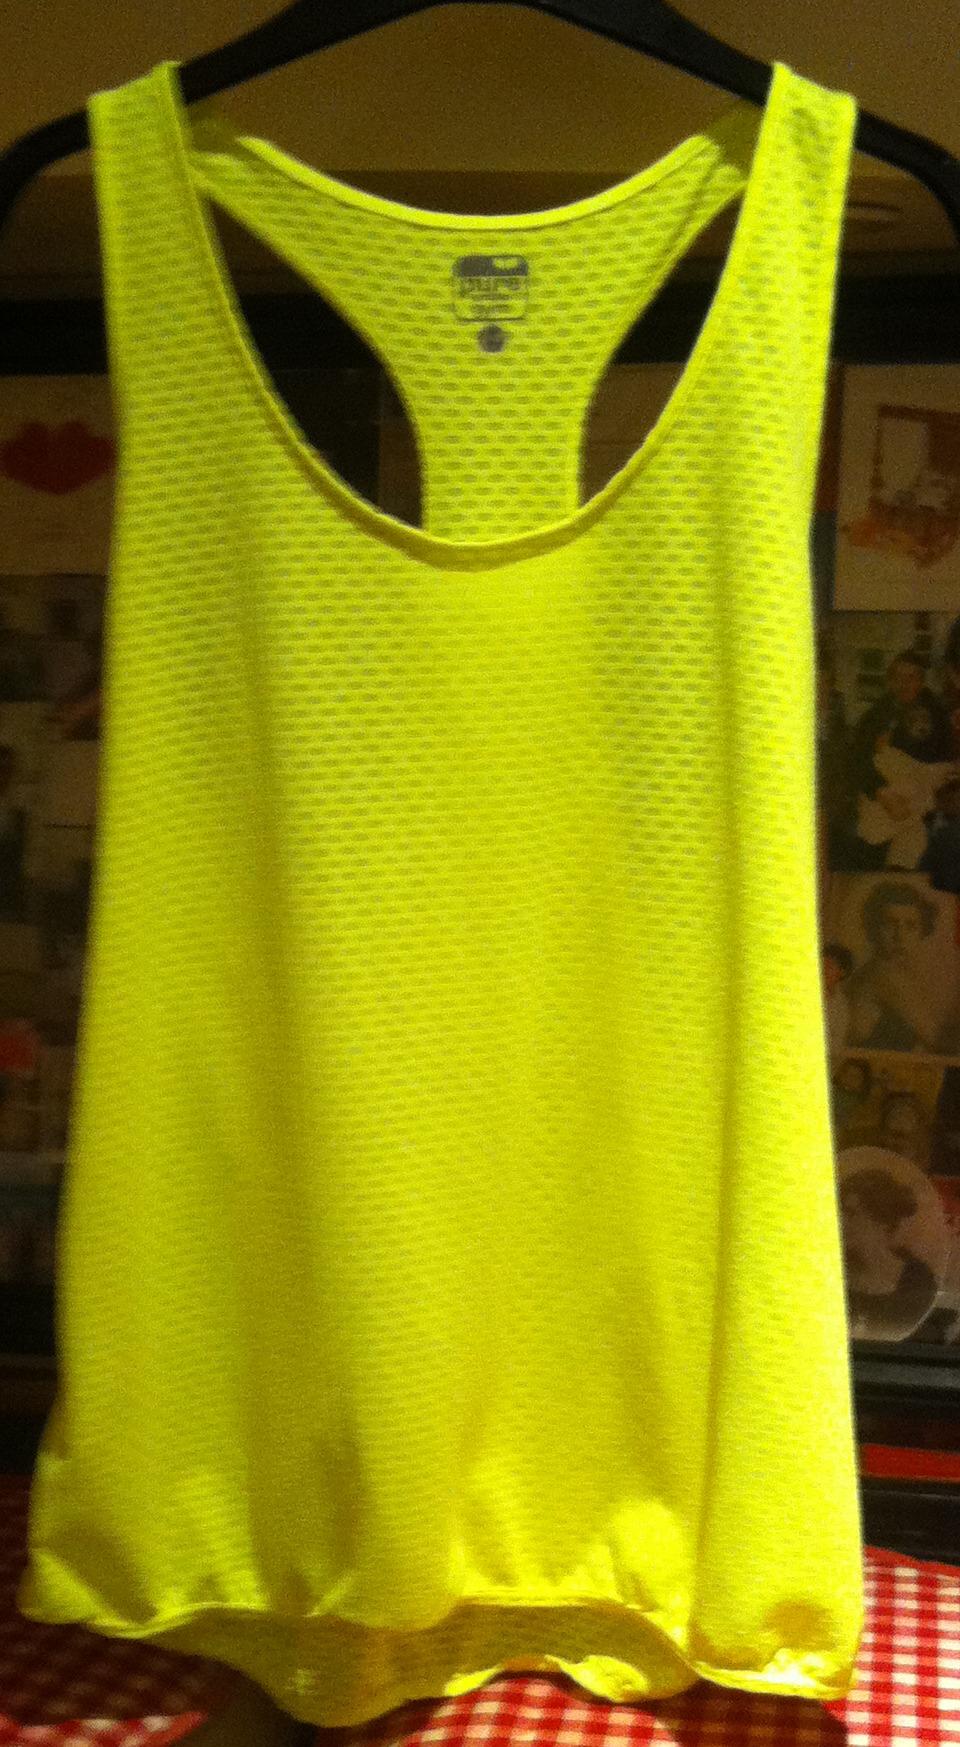 yellow jersey.jpg